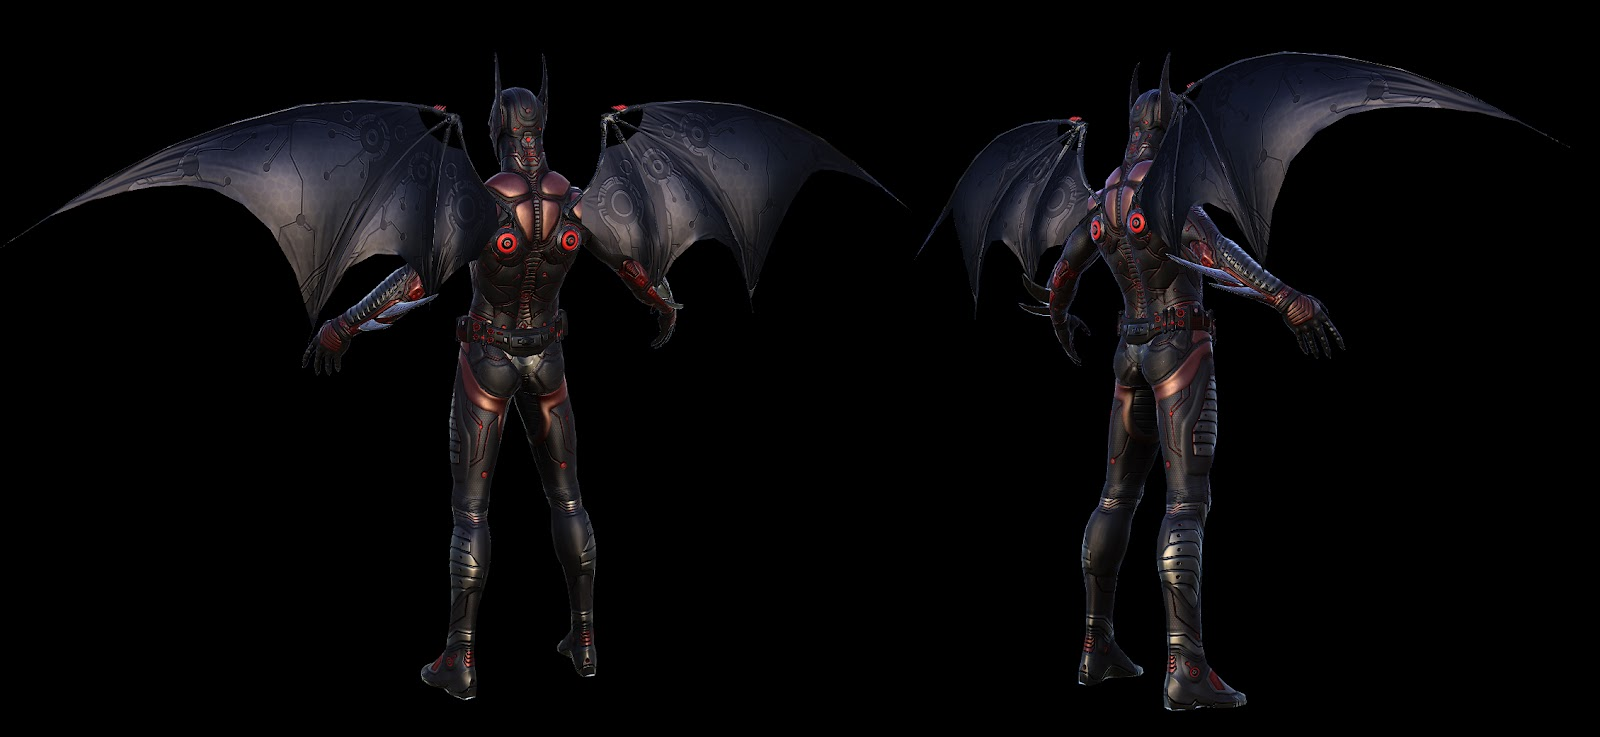 Firefly Fly 3d Live Wallpaper Comic Book Army Secuela De Batman Dark Knight Rises